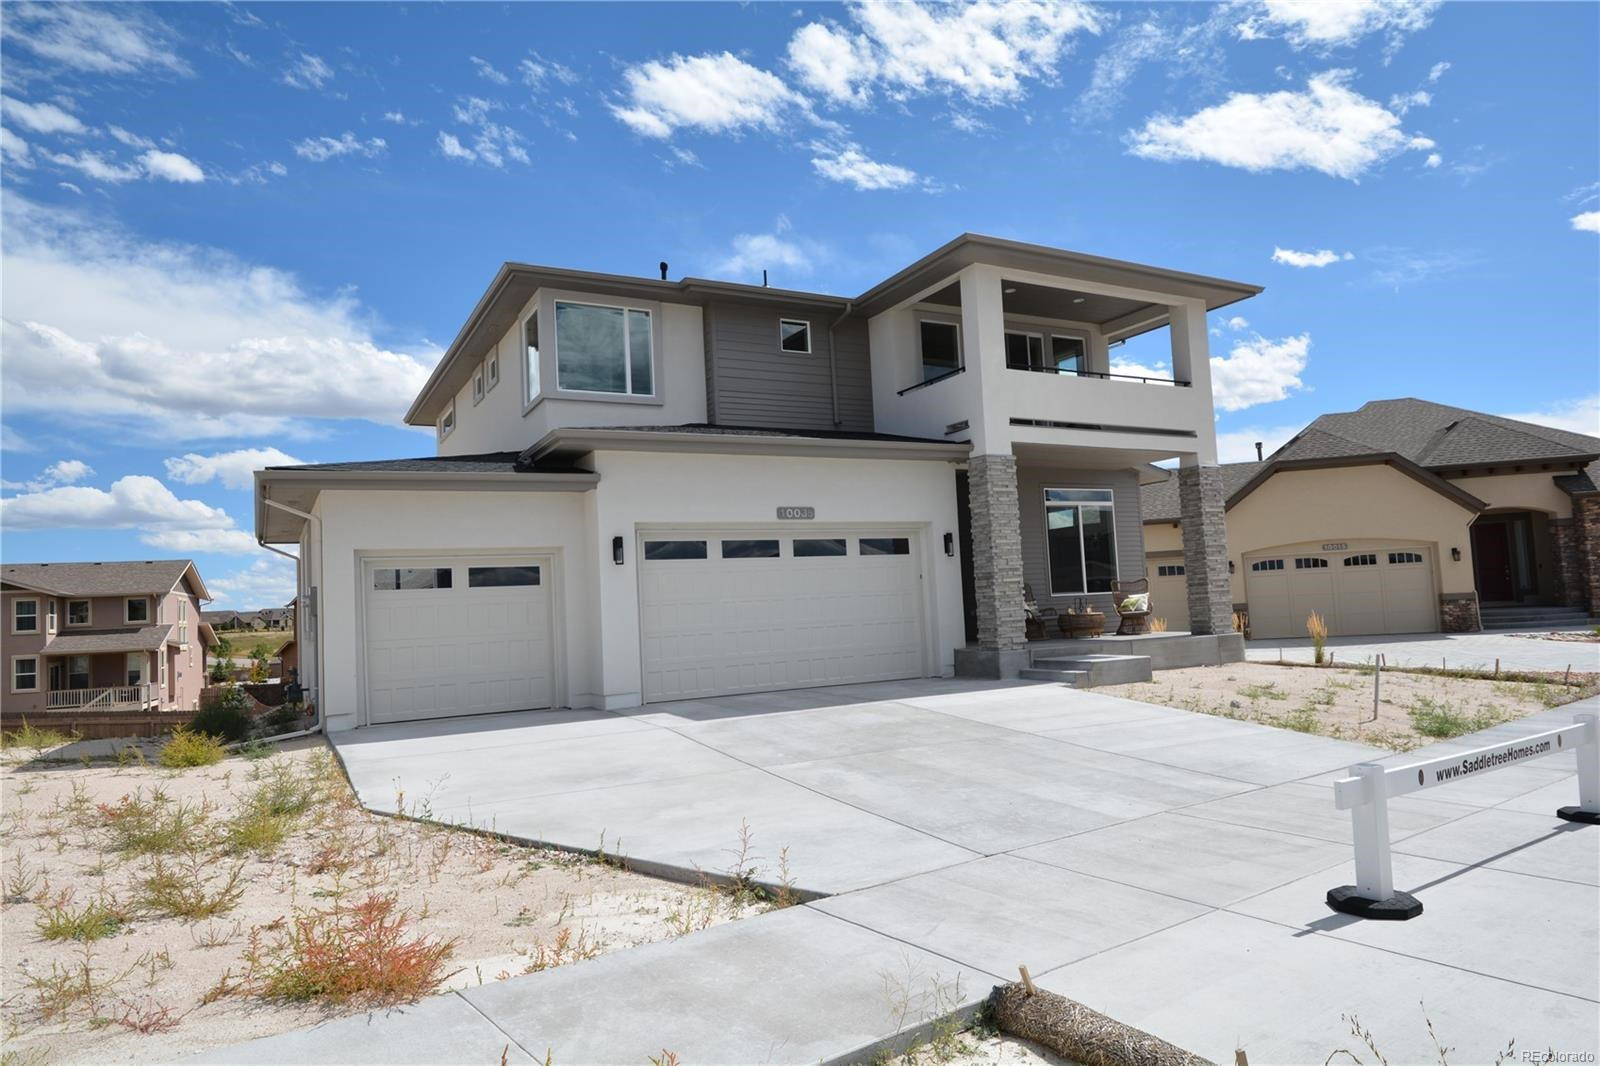 MLS# 2546268 - 3 - 10035 Buck Gulch Court, Colorado Springs, CO 80924